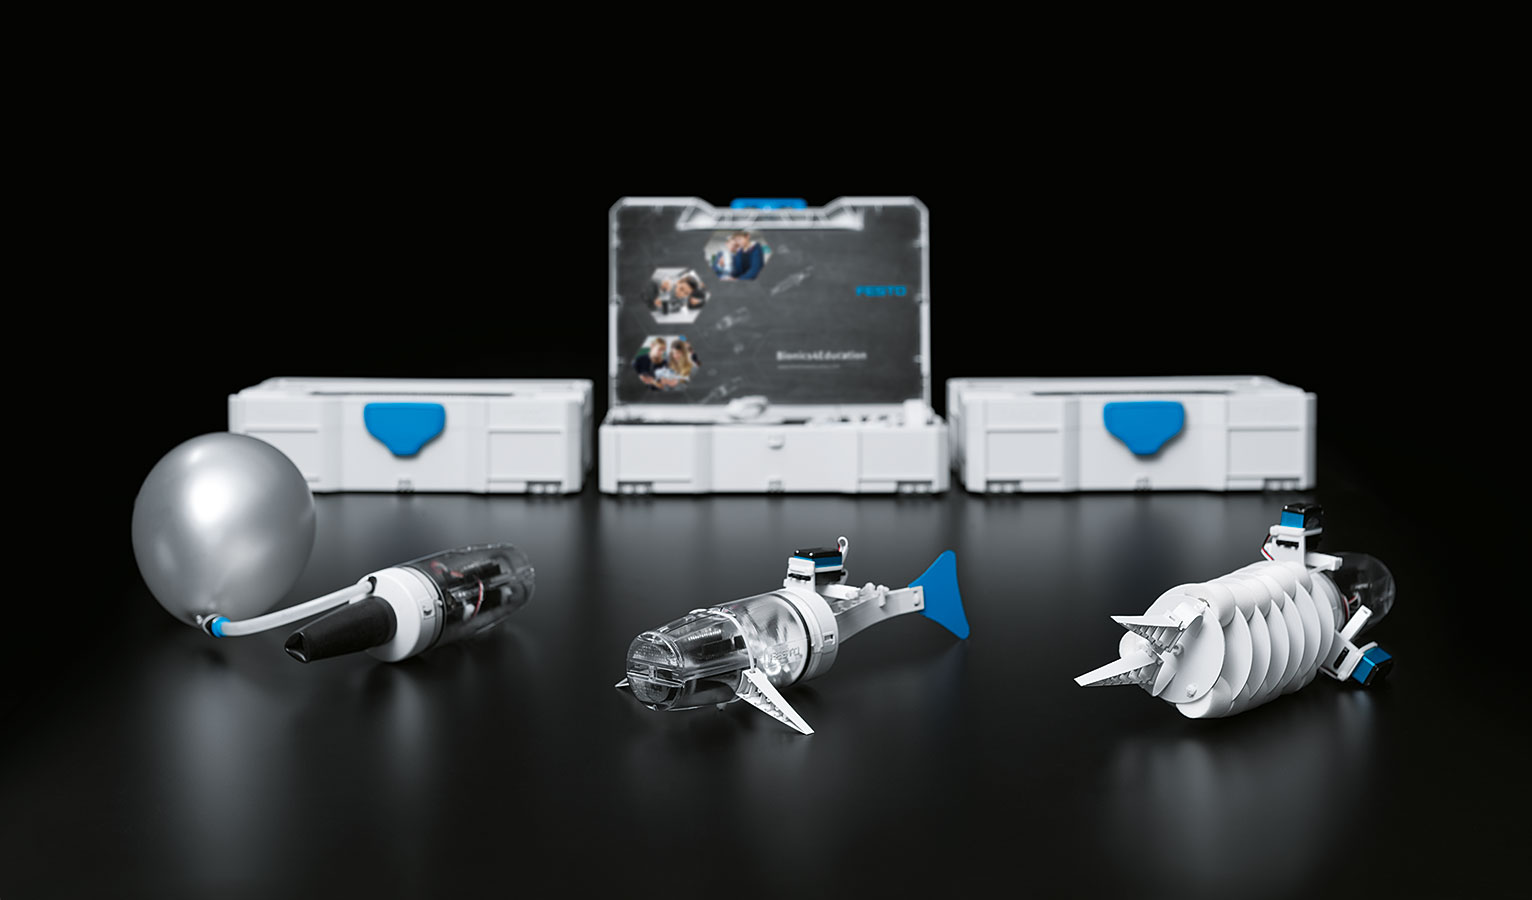 Festo仿生技术助力工业自动化升级